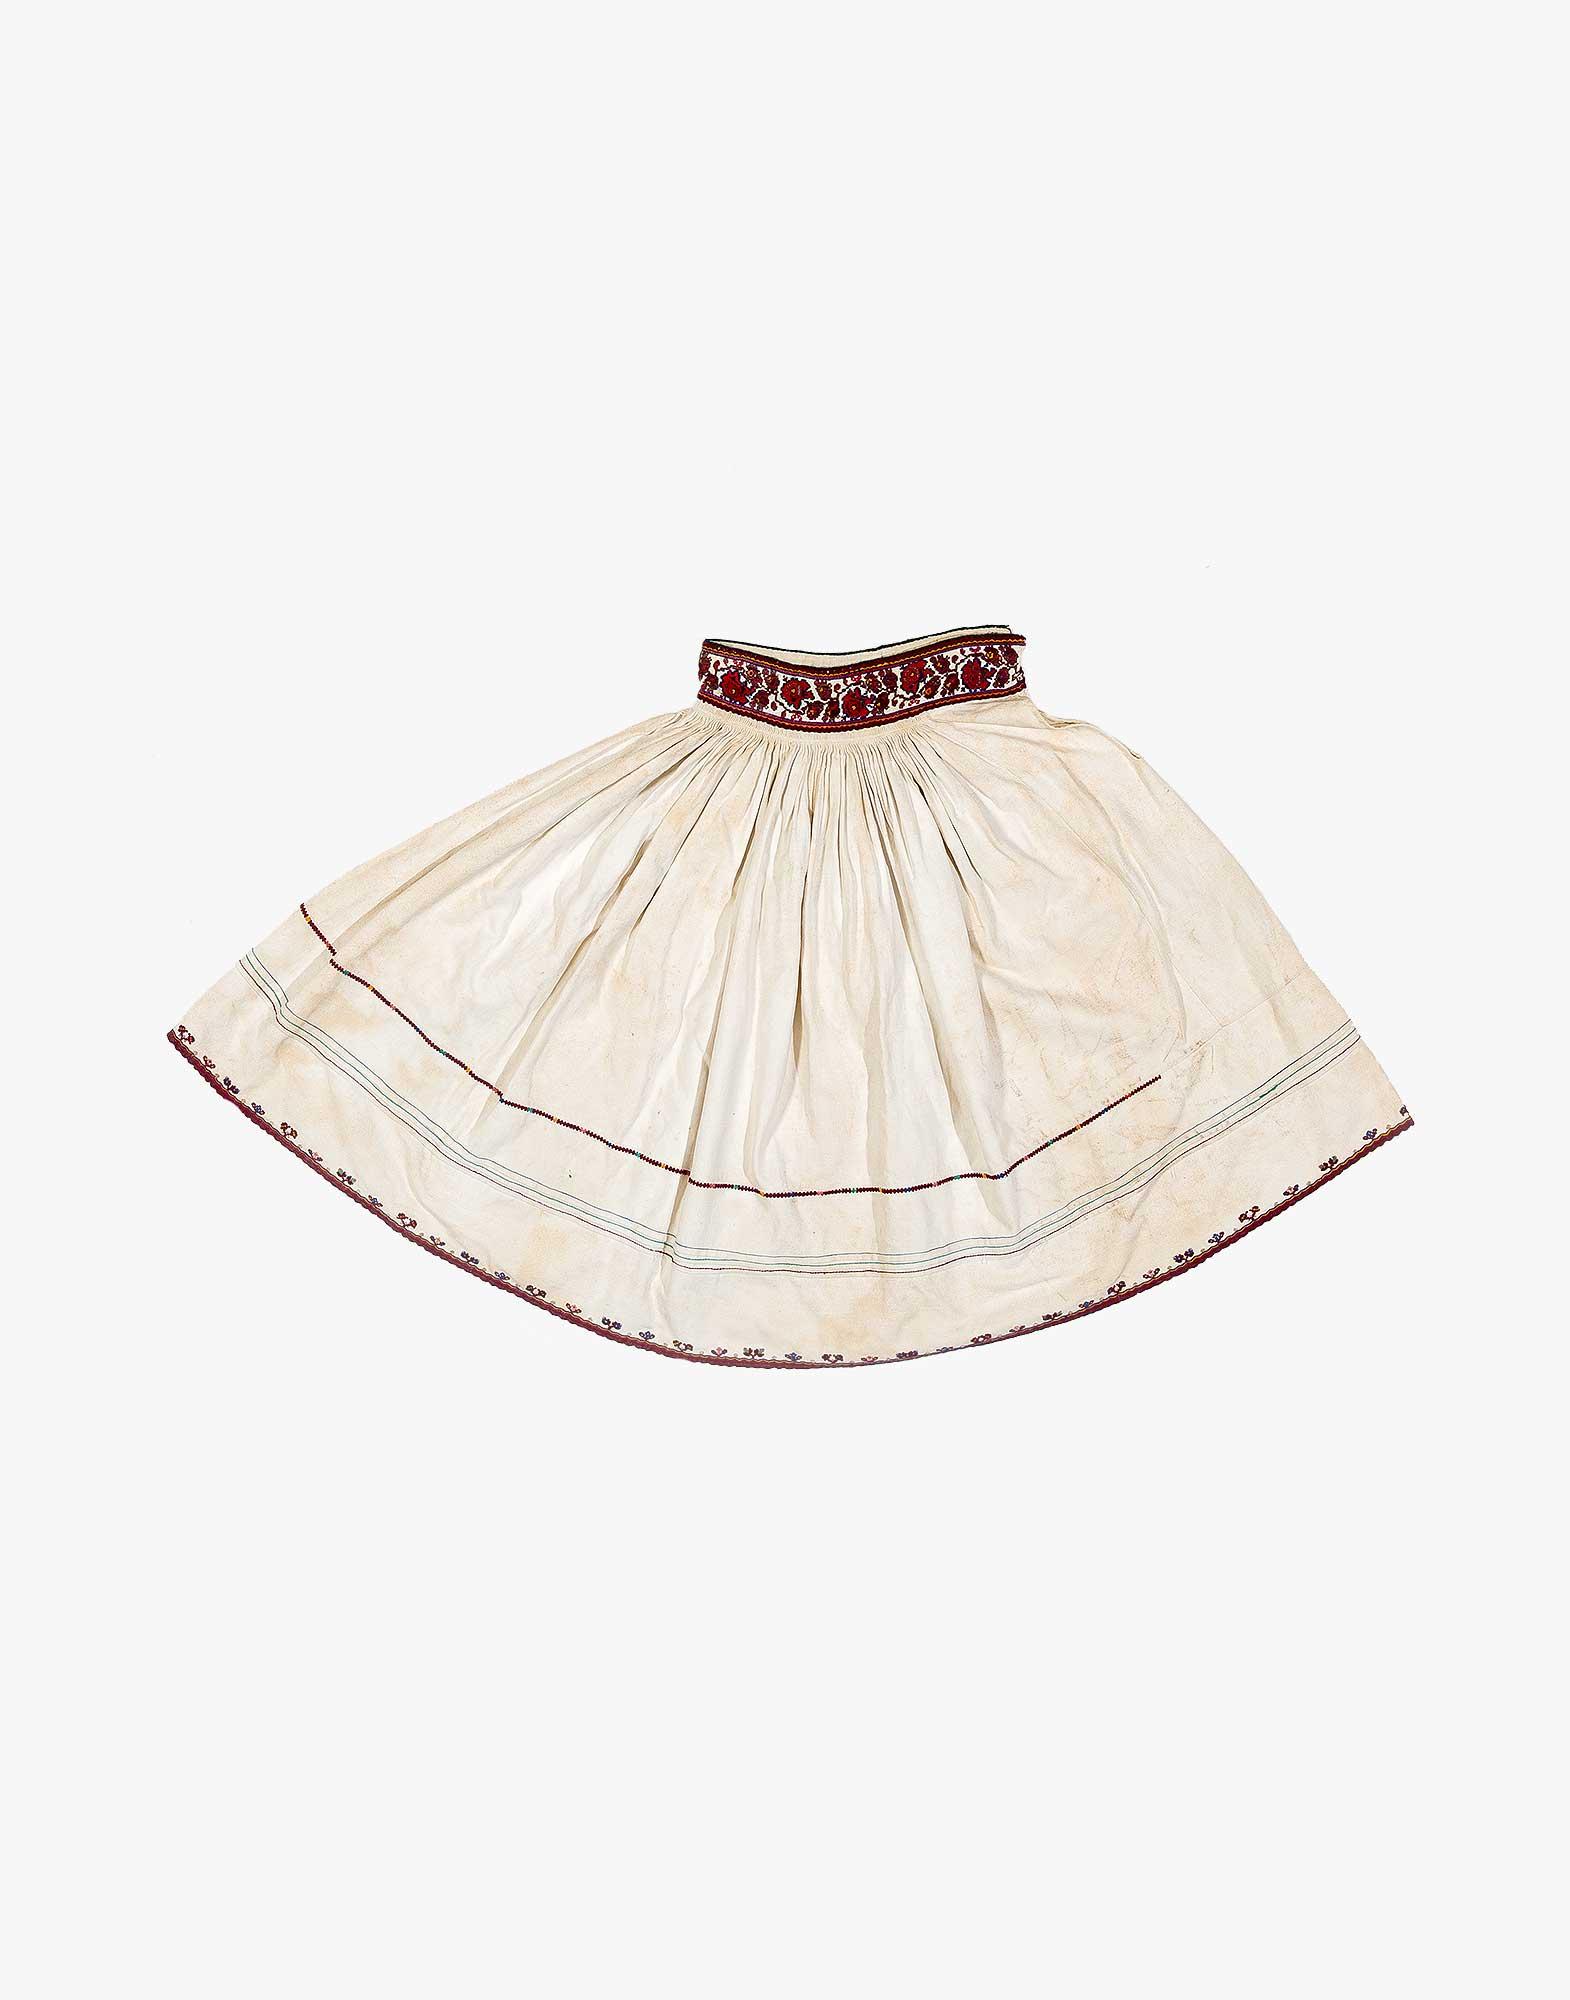 Hungarian Cotton Skirt